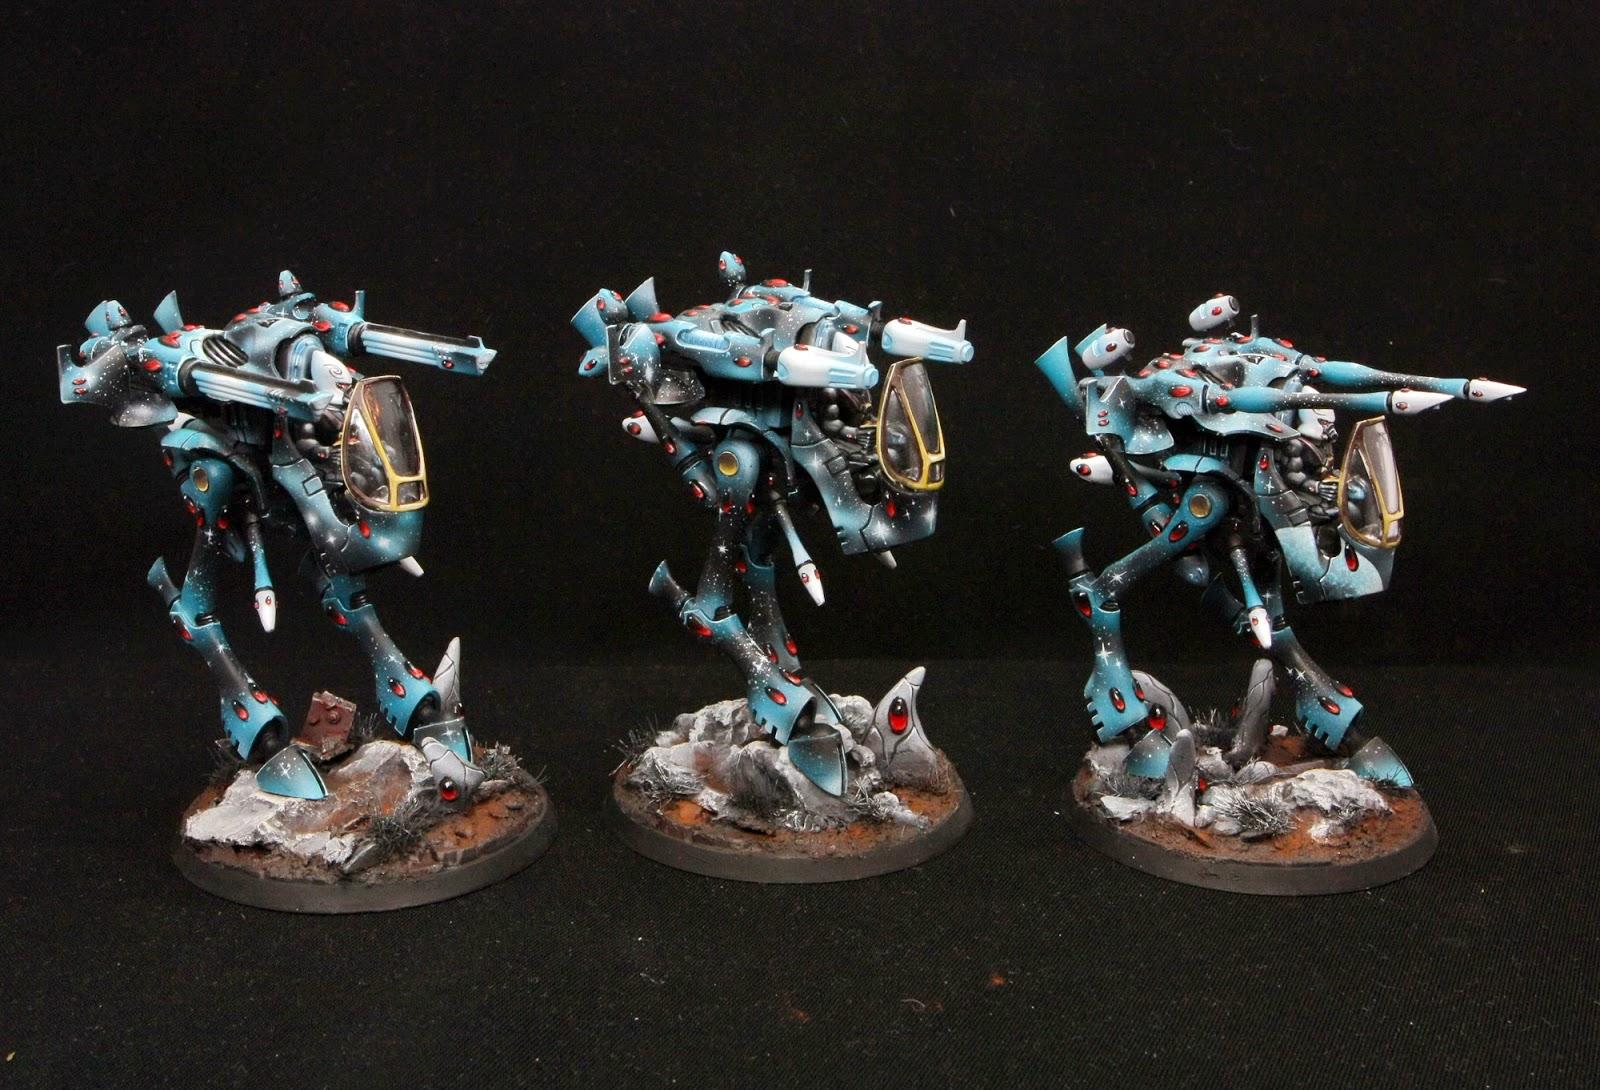 Serpentarium space eldar army walkers next part of space eldar army in turqoise color publicscrutiny Image collections